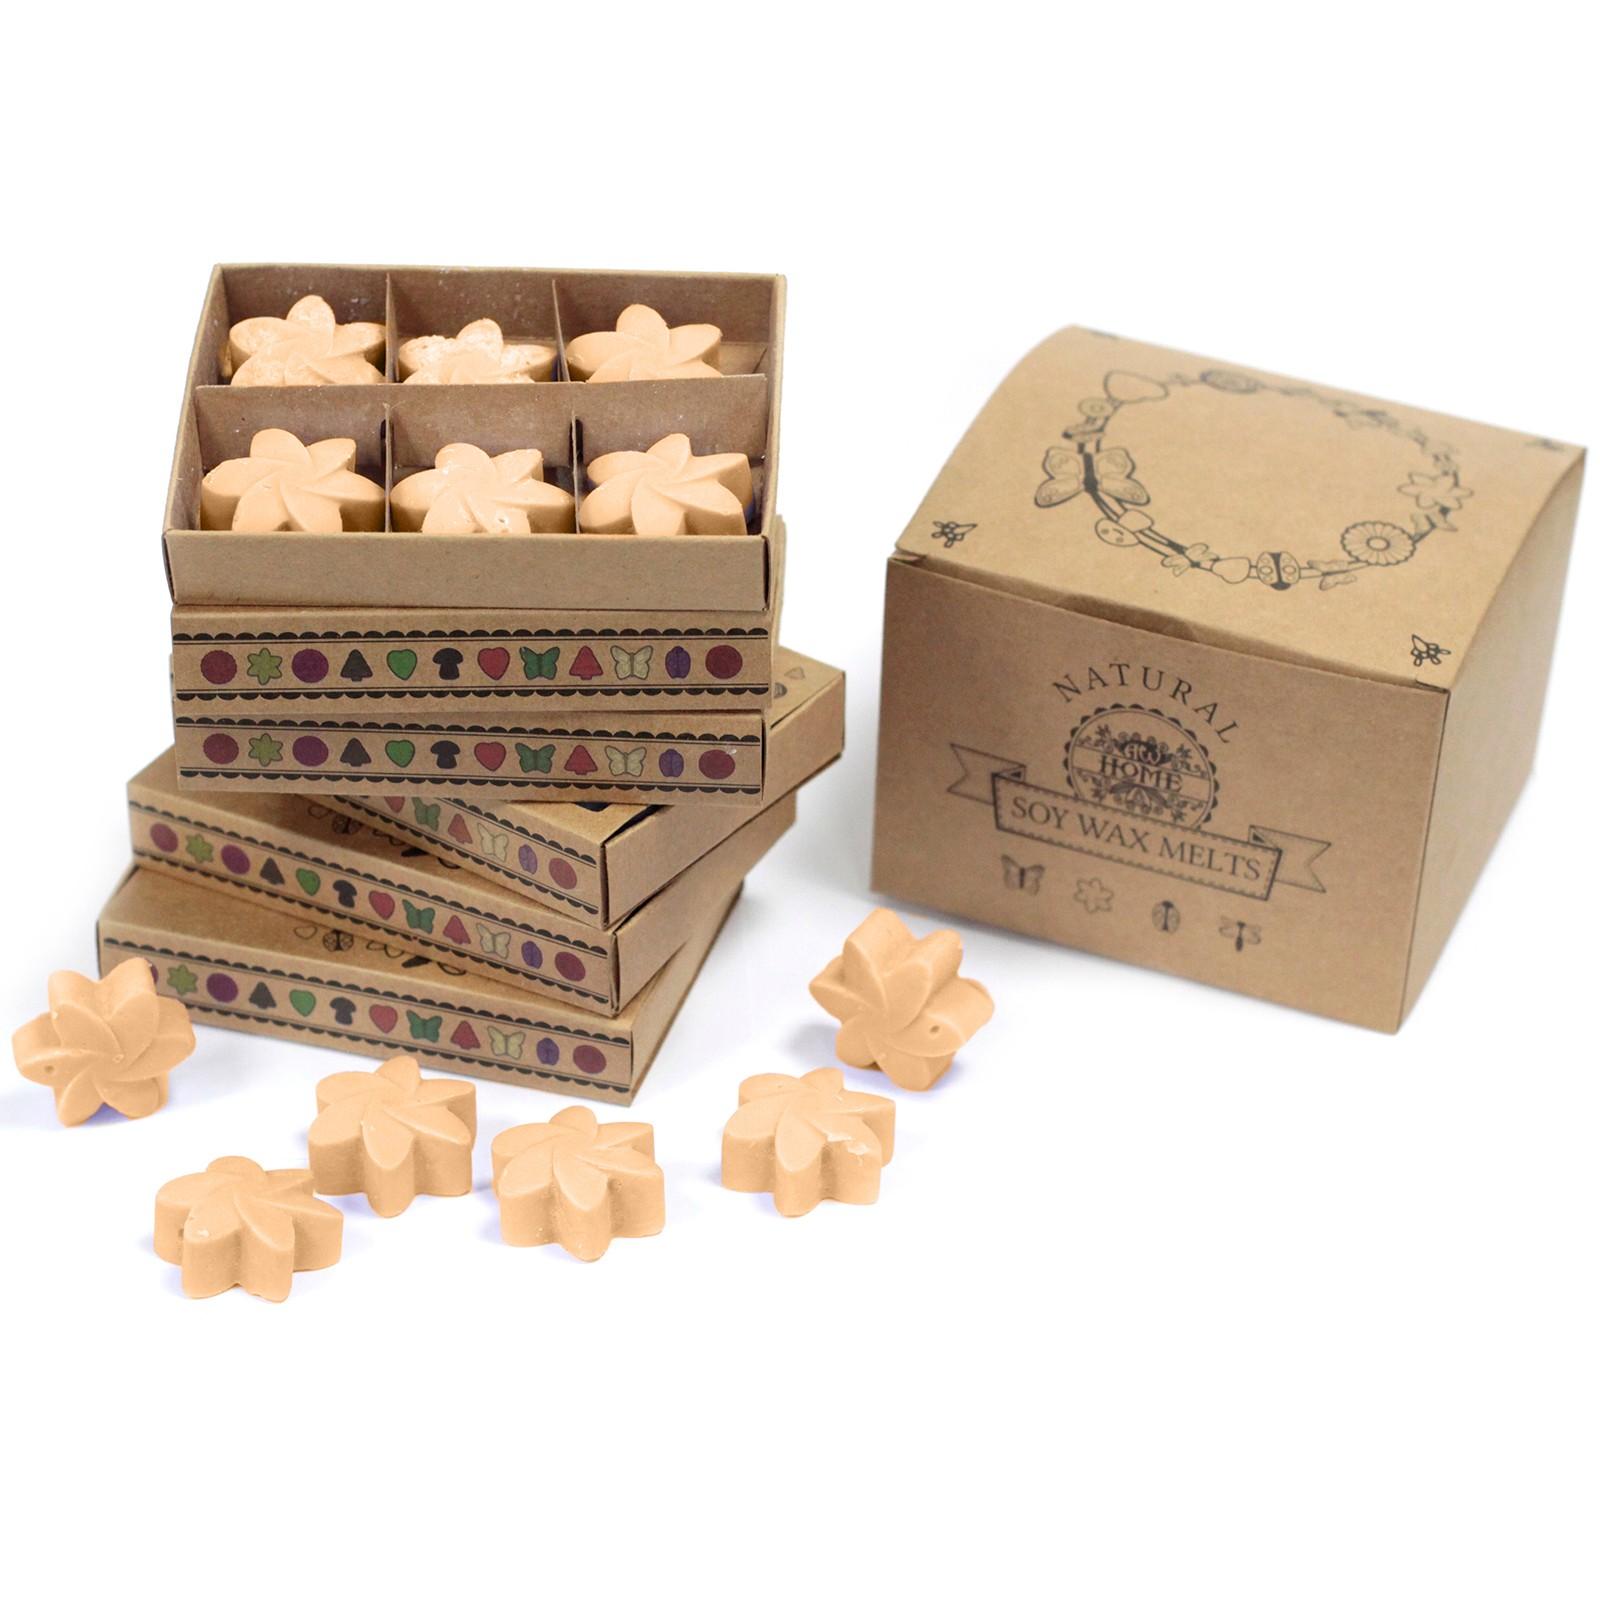 Box of 6 Wax Melts Midnight Jasmine